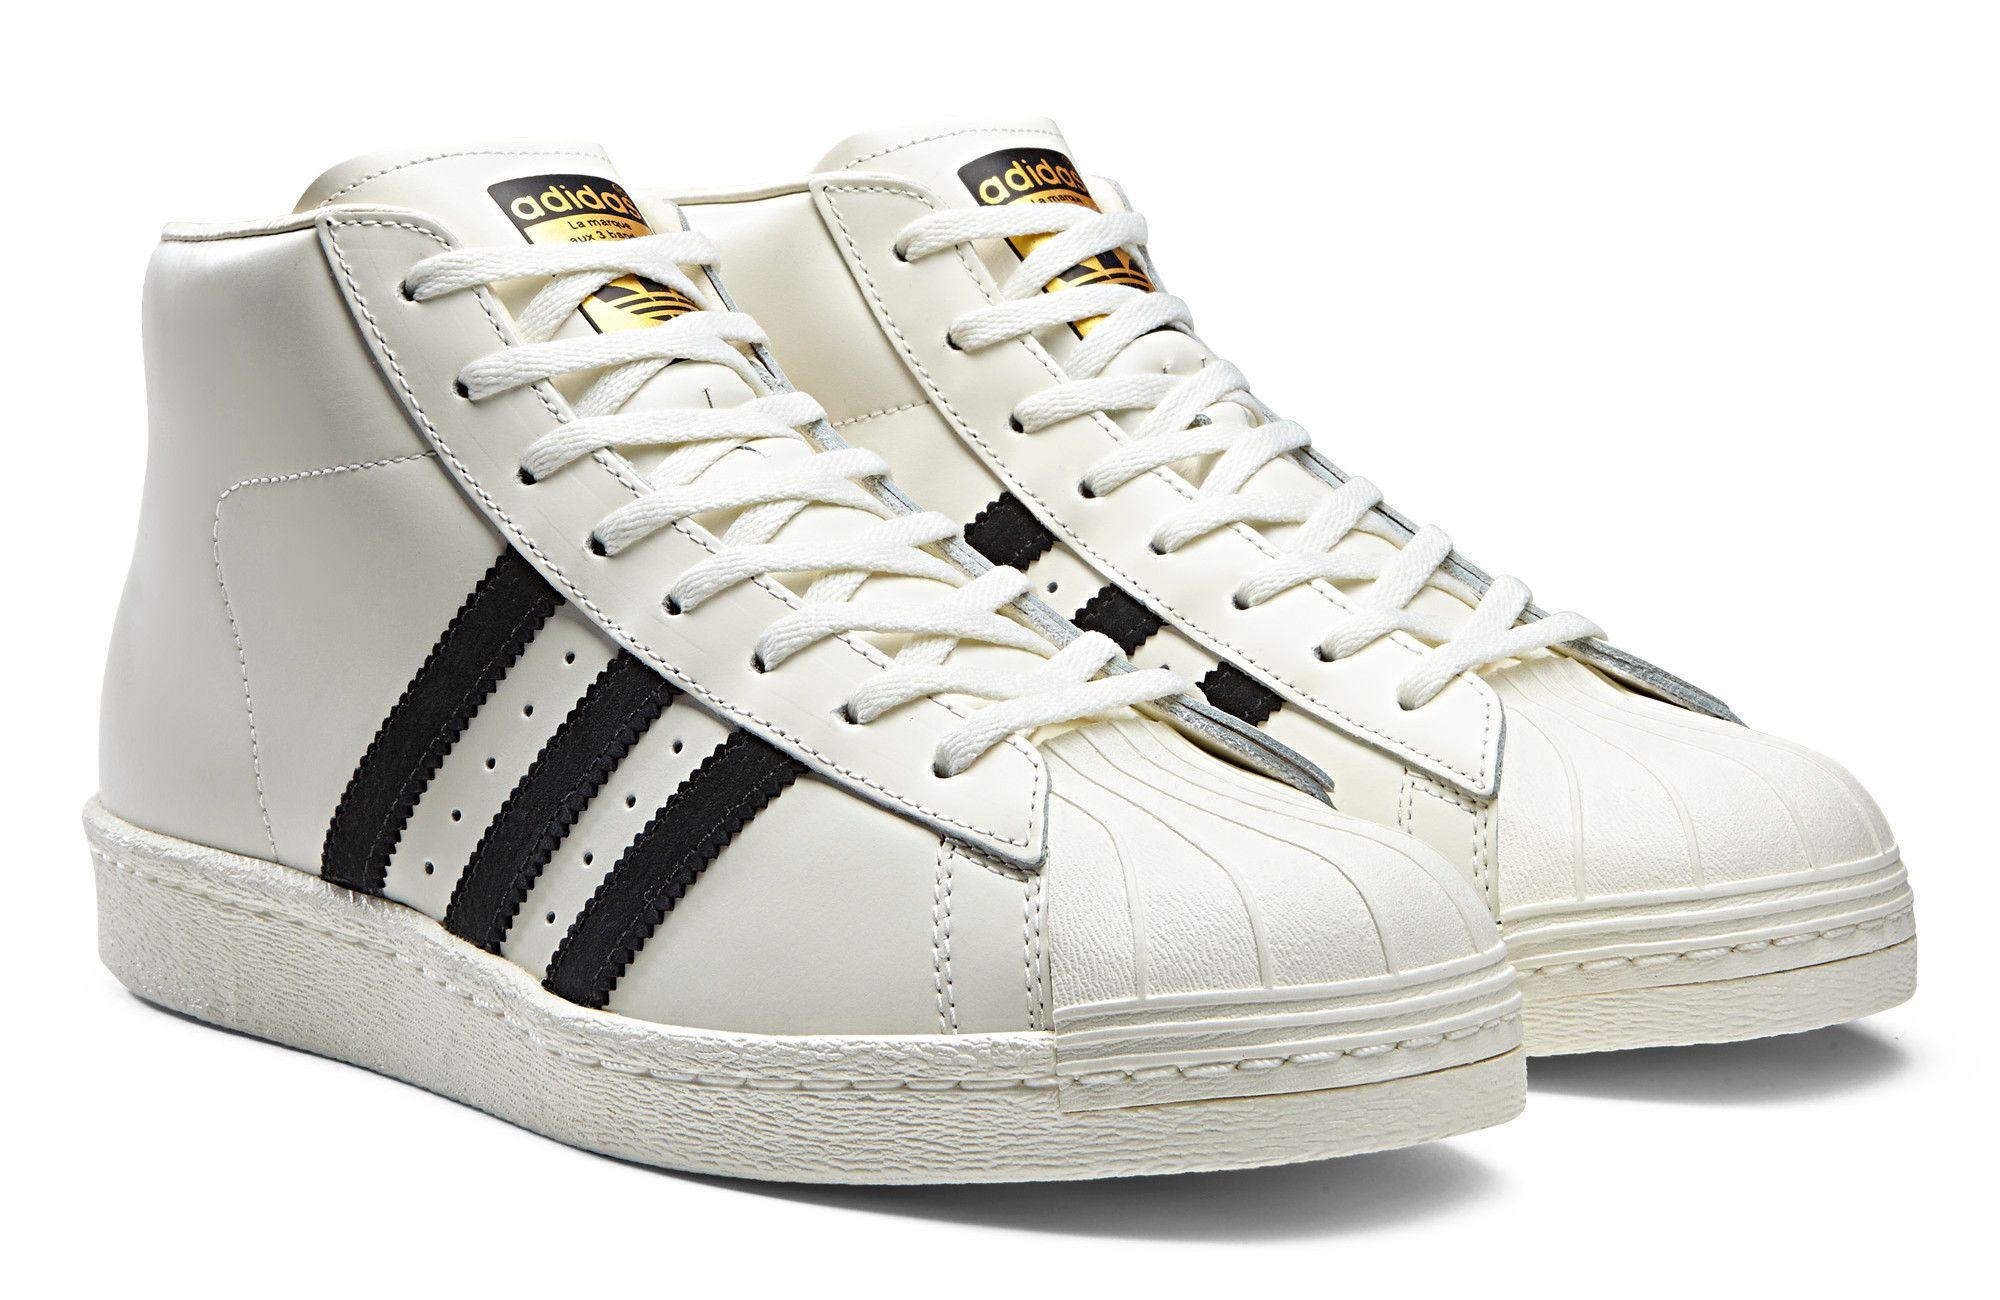 adidas adizero, adidas Superstar Promodel Sneaker